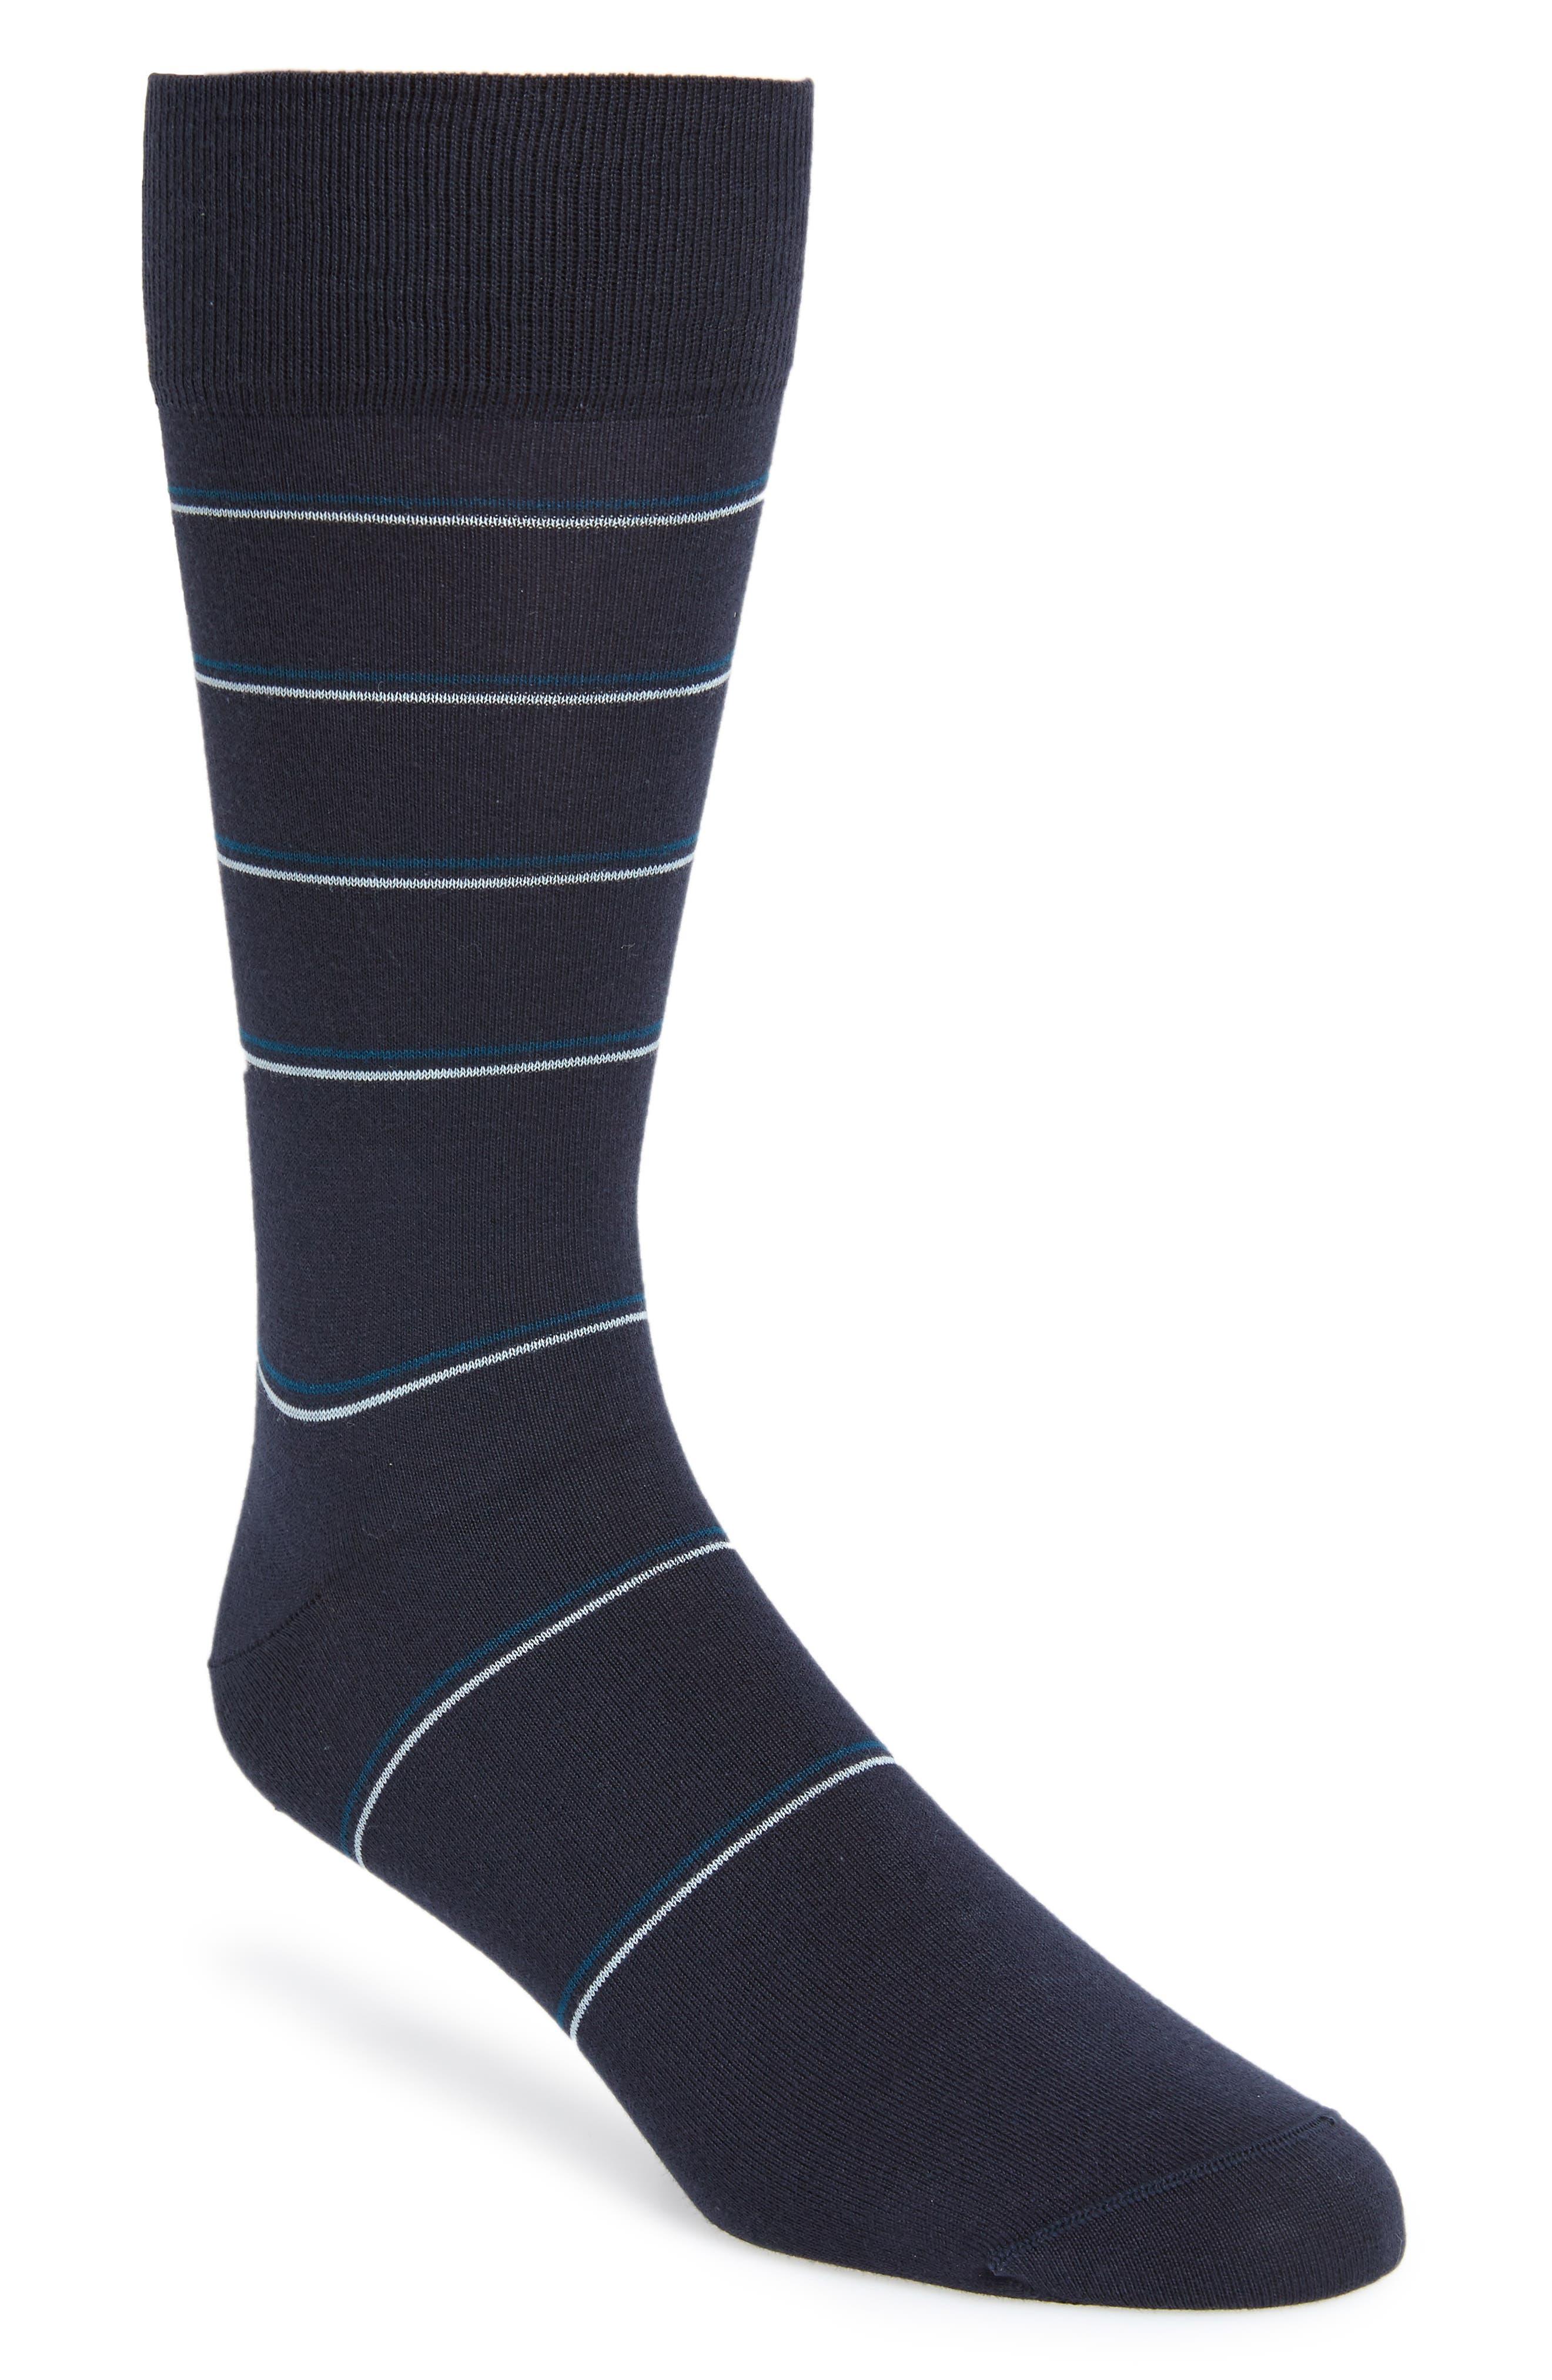 Stripe Socks,                         Main,                         color, NAVY HEATHER/ WHITE